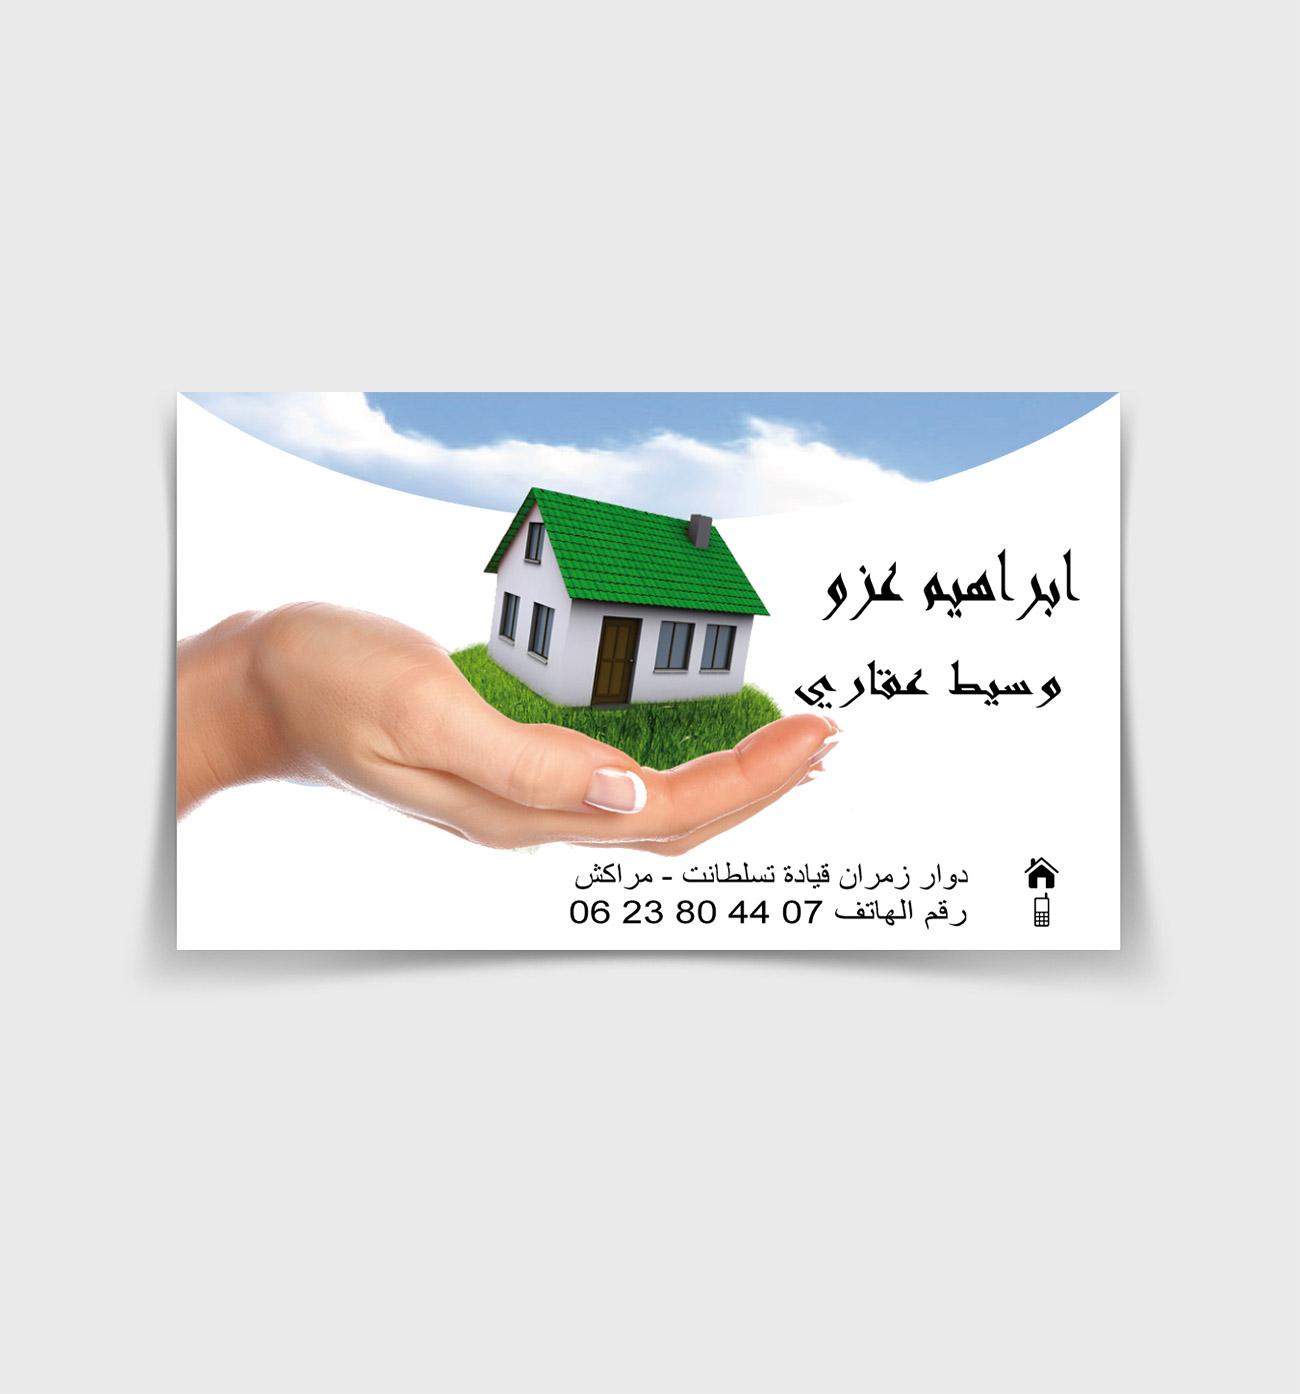 Ibrahim Aazm